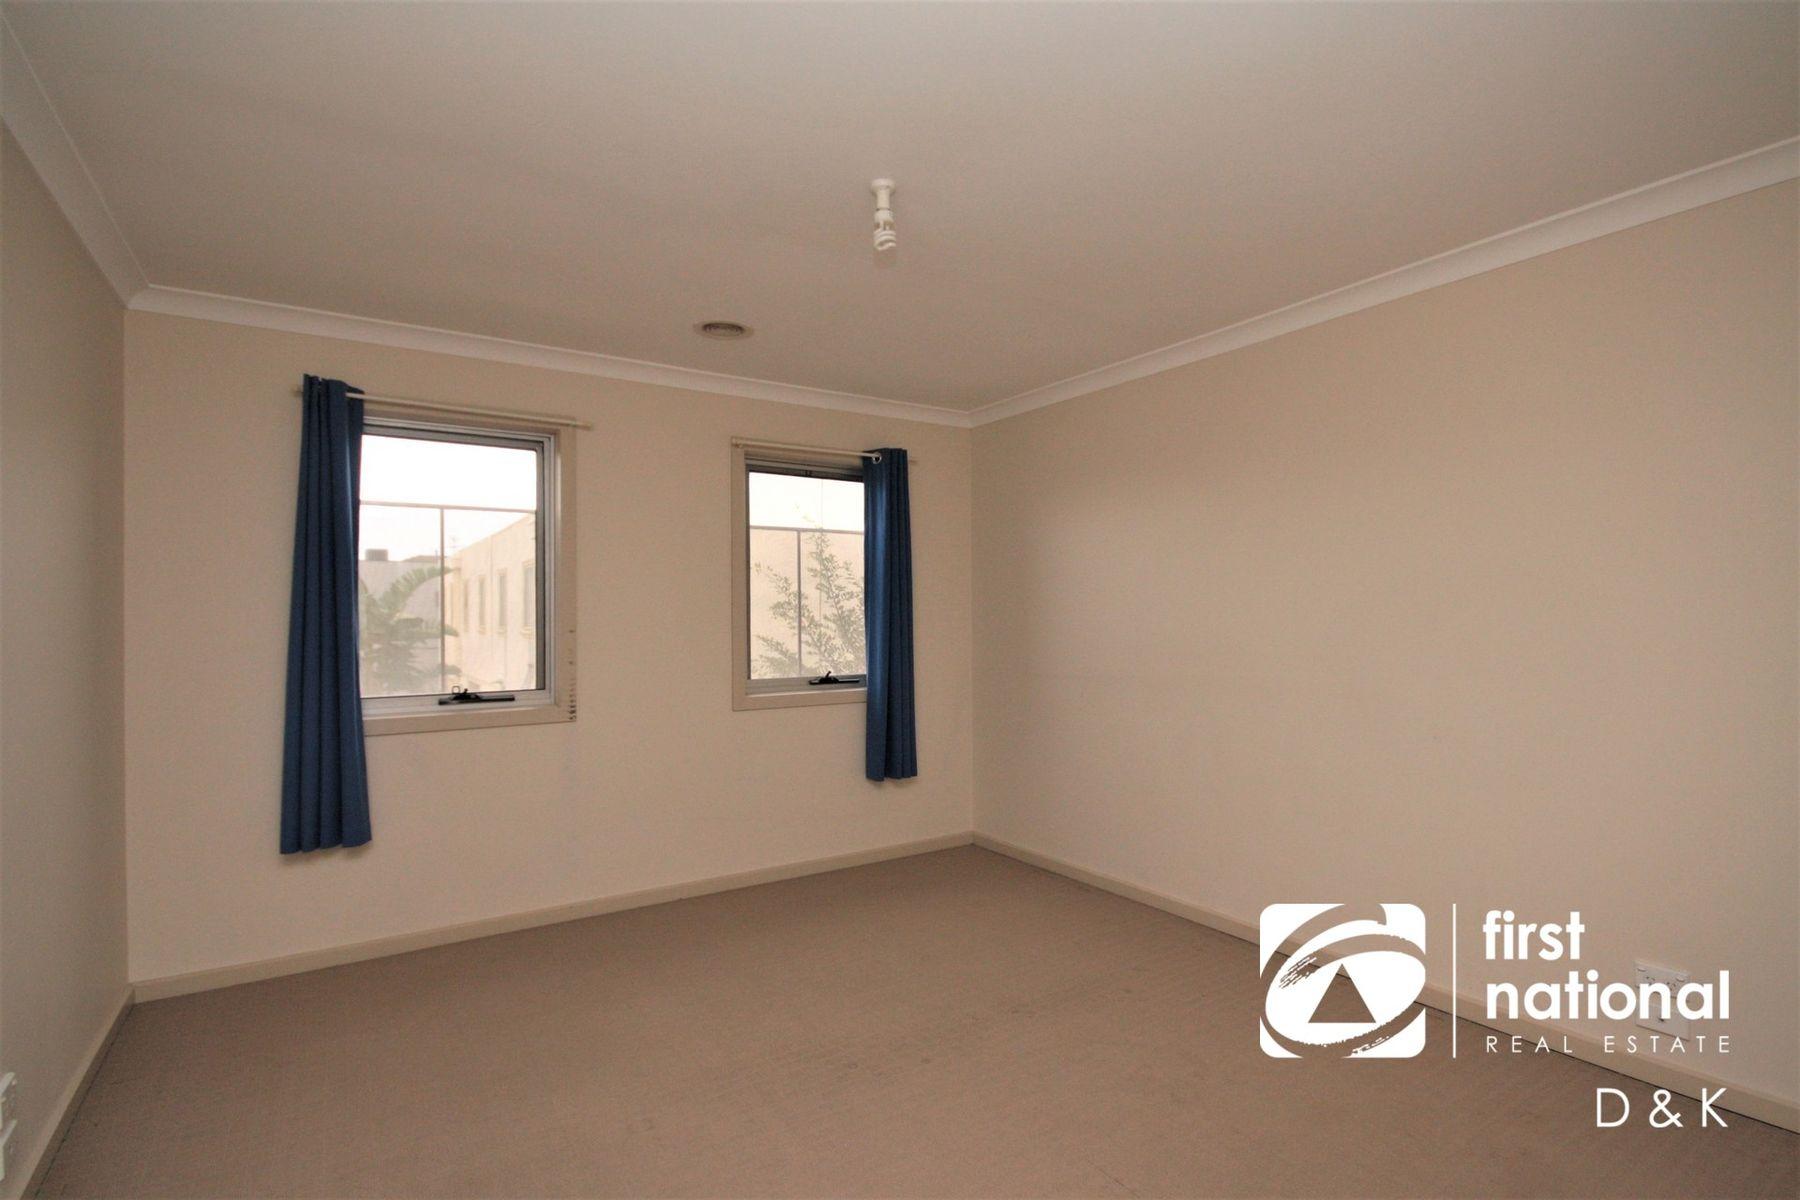 3/231 Ballarat Road, Braybrook, VIC 3019